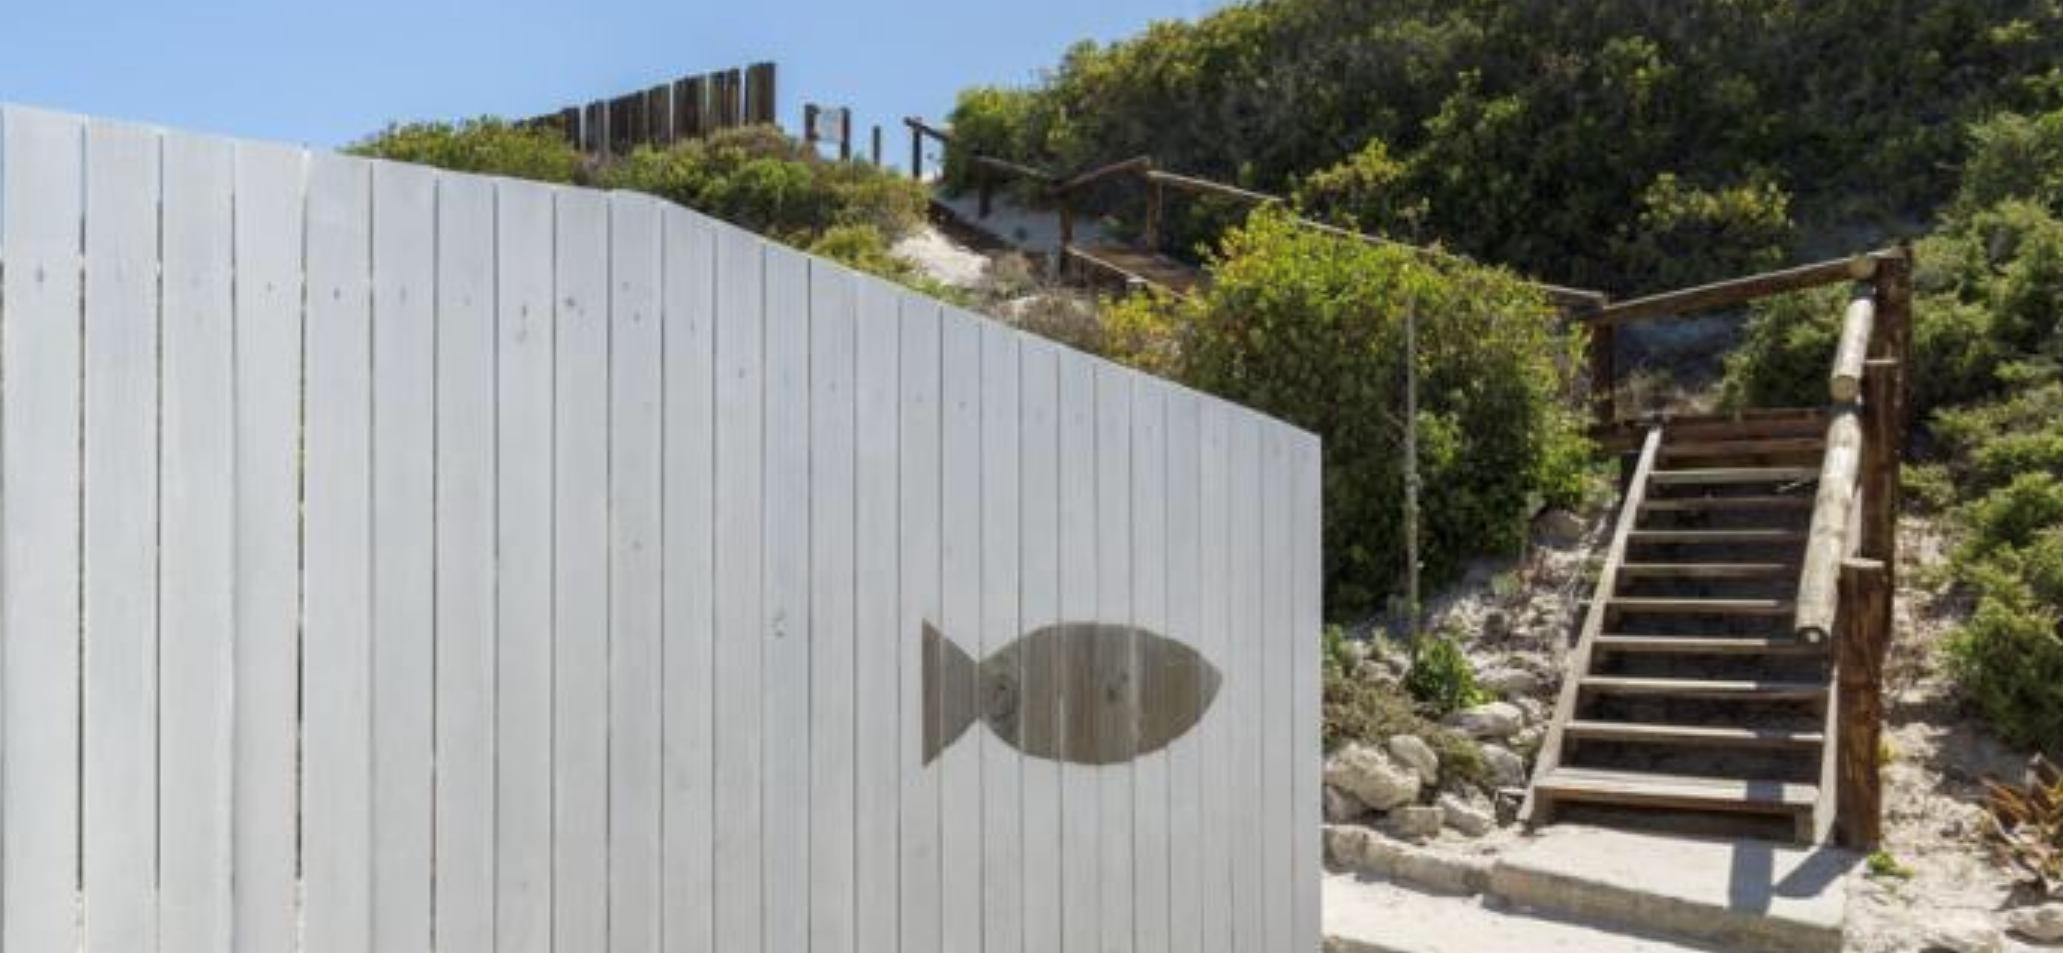 Rooisee beach cottage